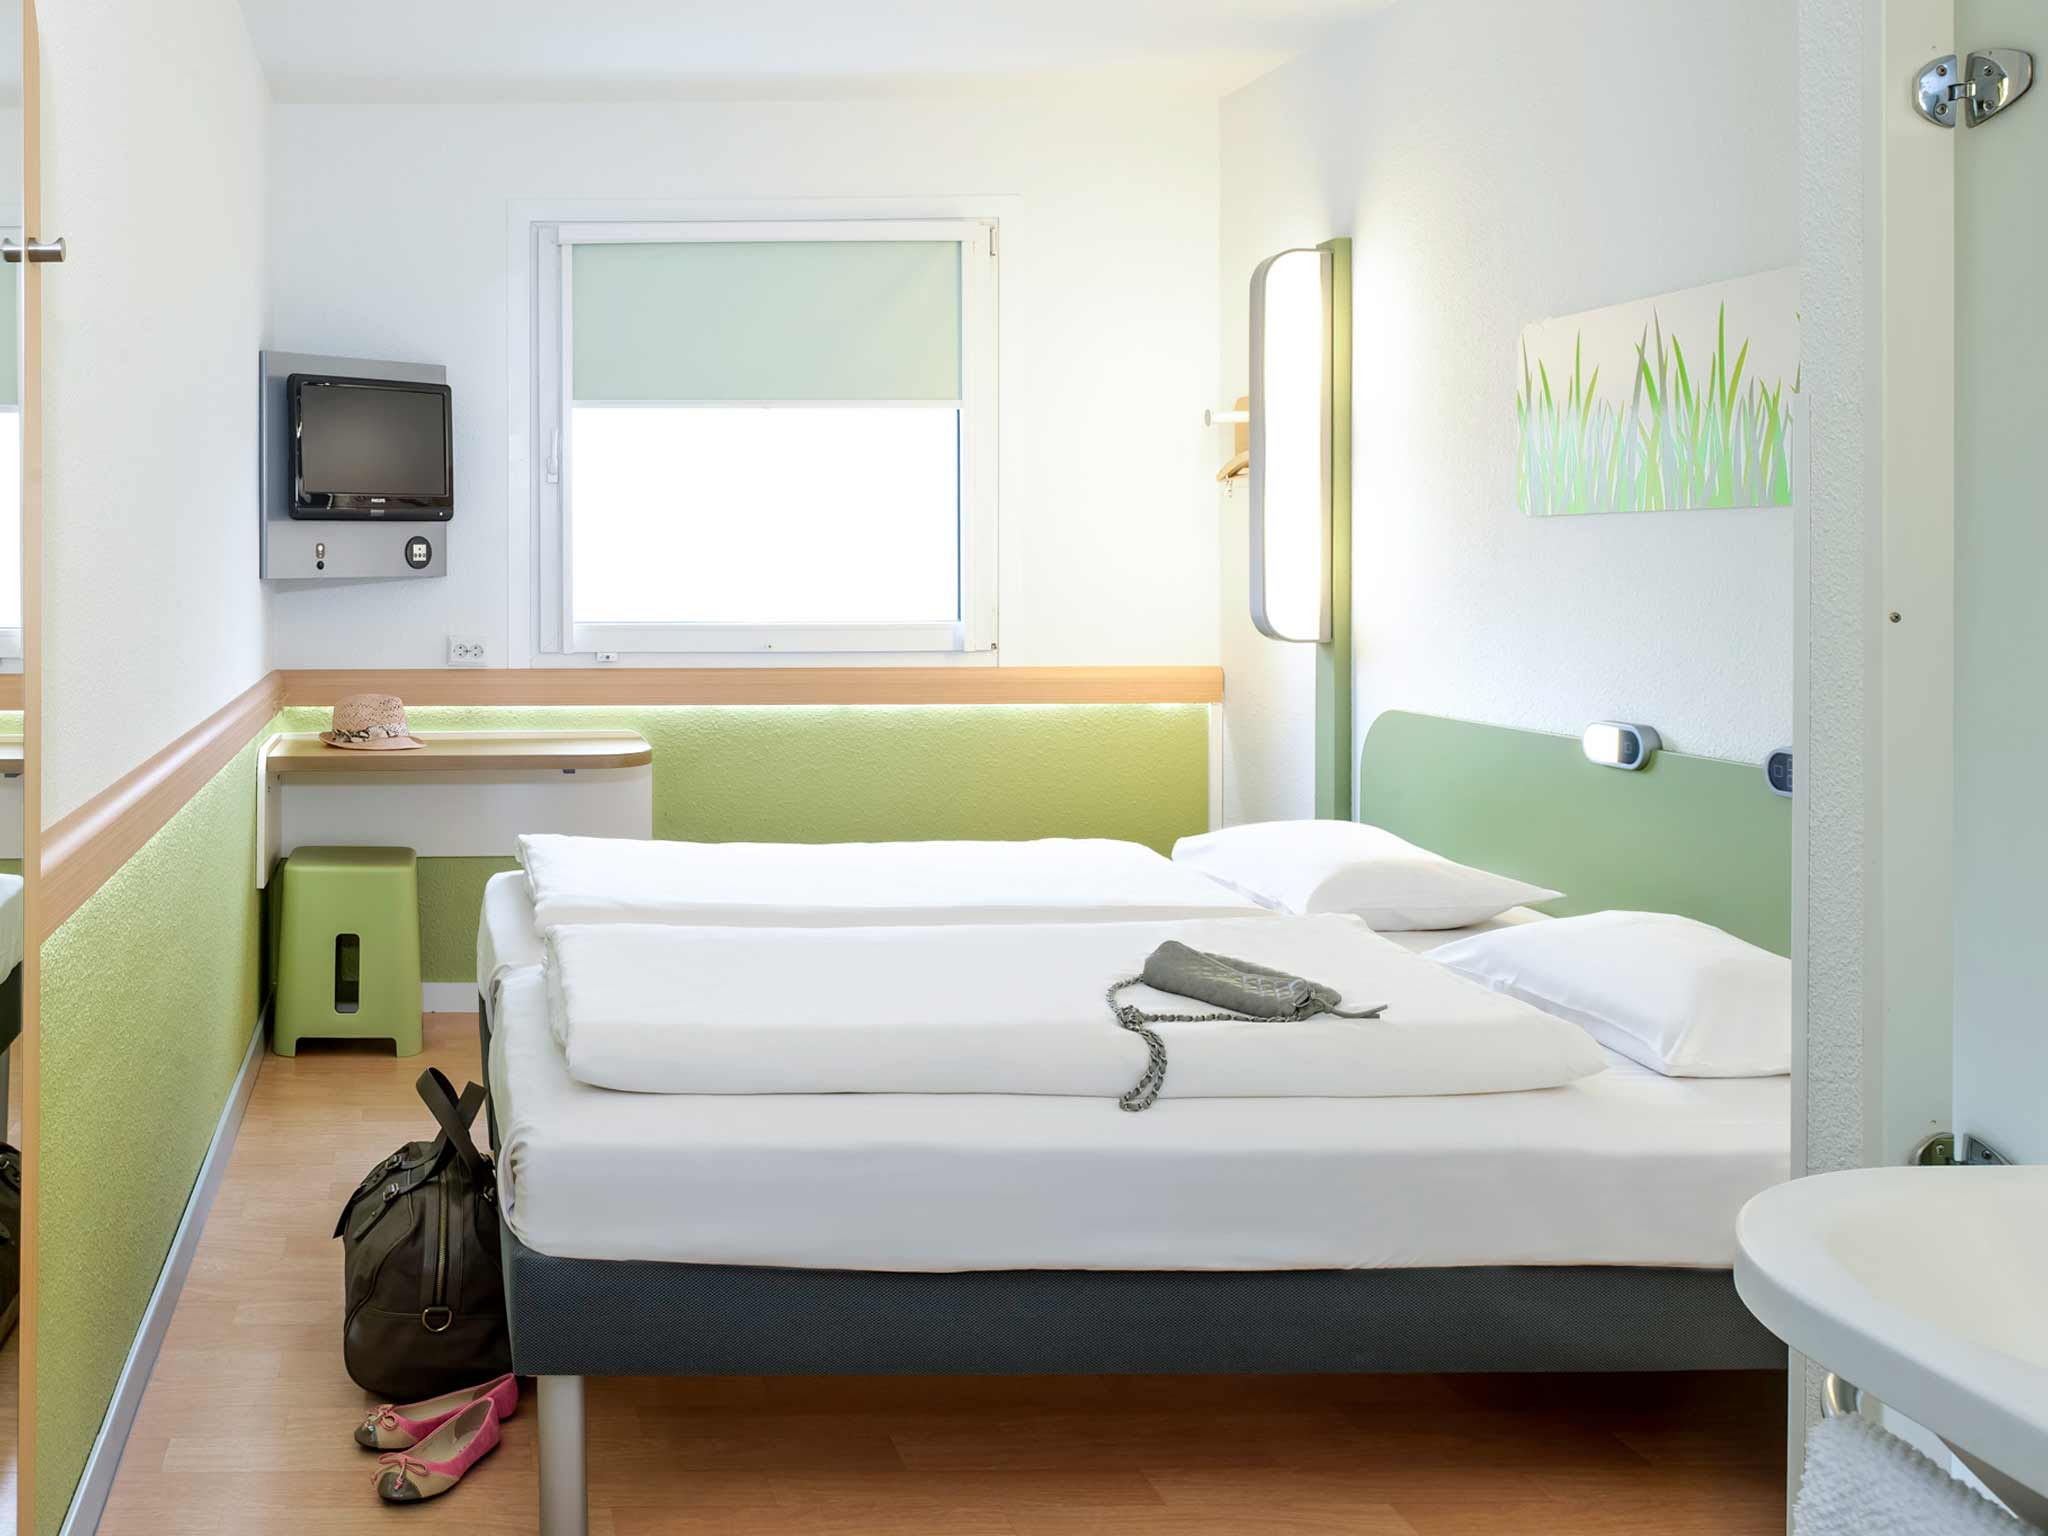 hotel ibis budget augsburg gersthofen book now free wifi. Black Bedroom Furniture Sets. Home Design Ideas